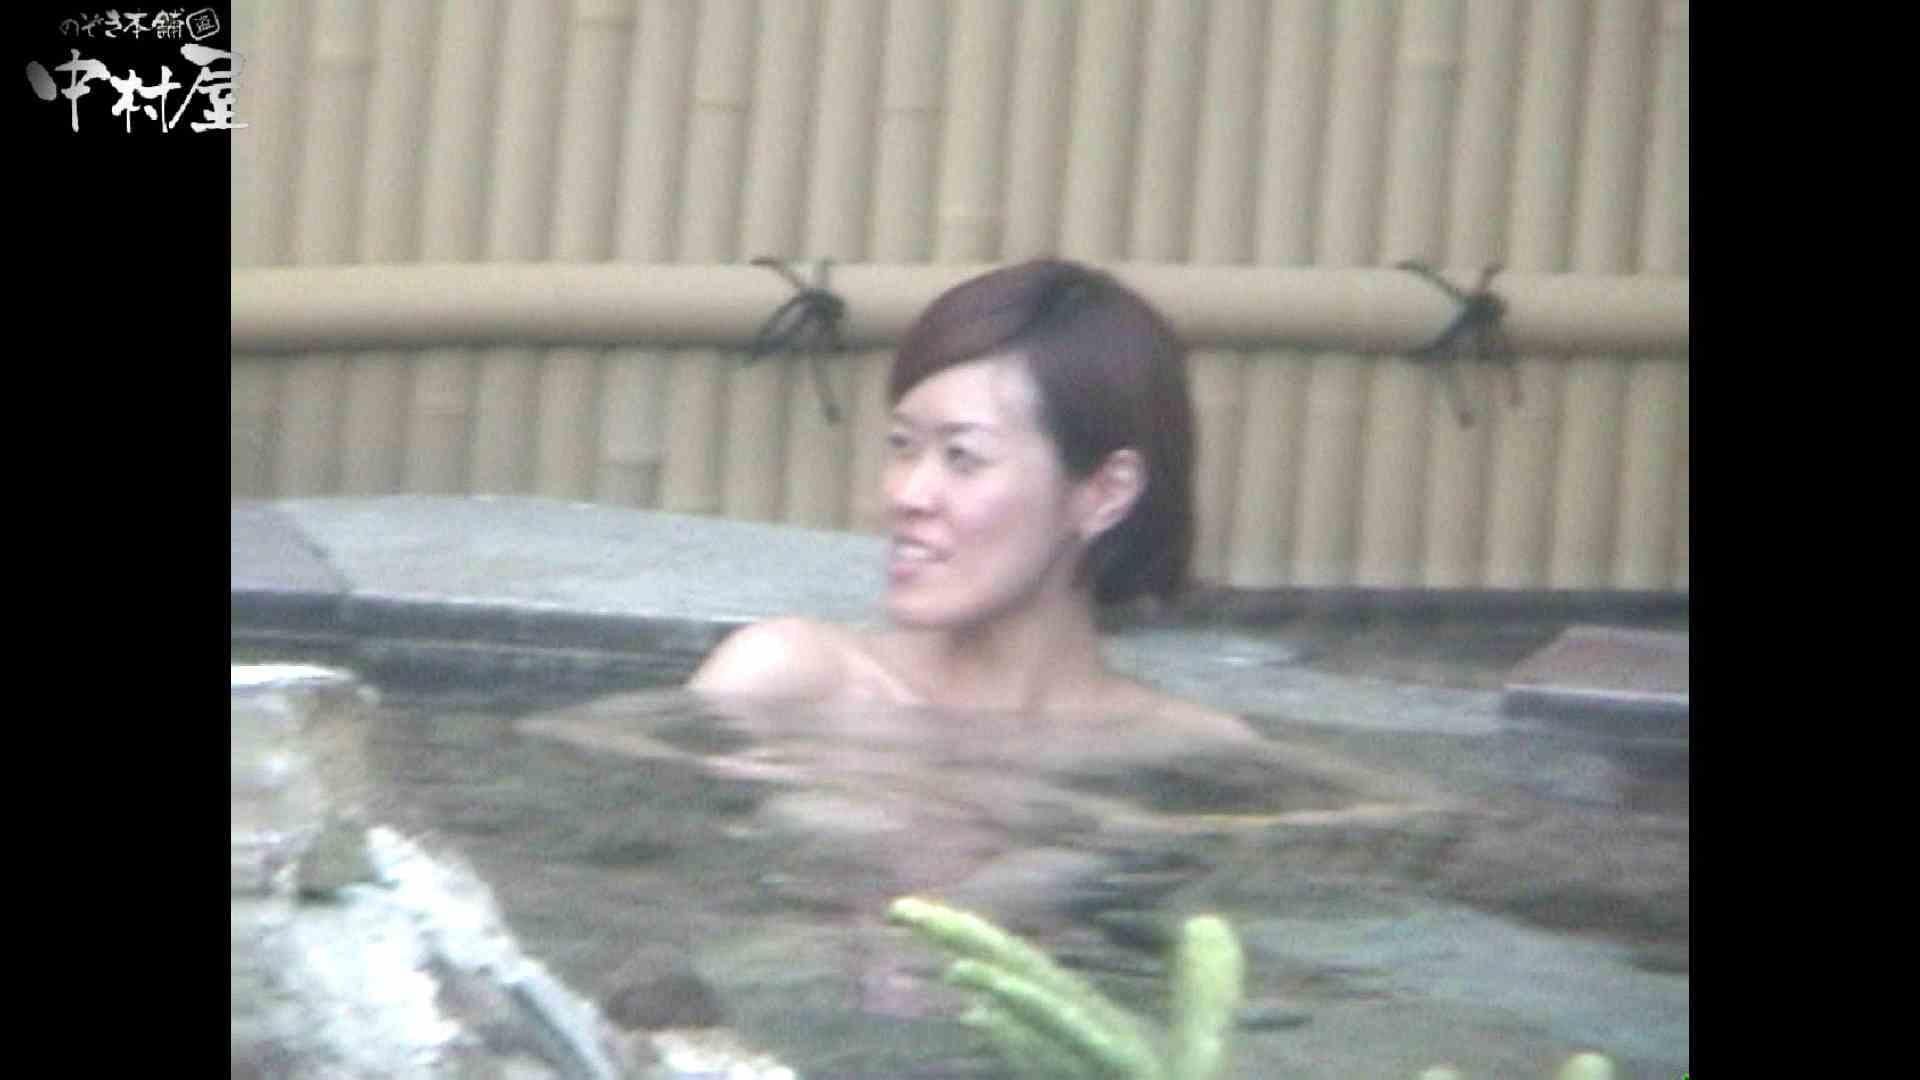 Aquaな露天風呂Vol.961 露天風呂 | OLのエロ生活  104連発 34